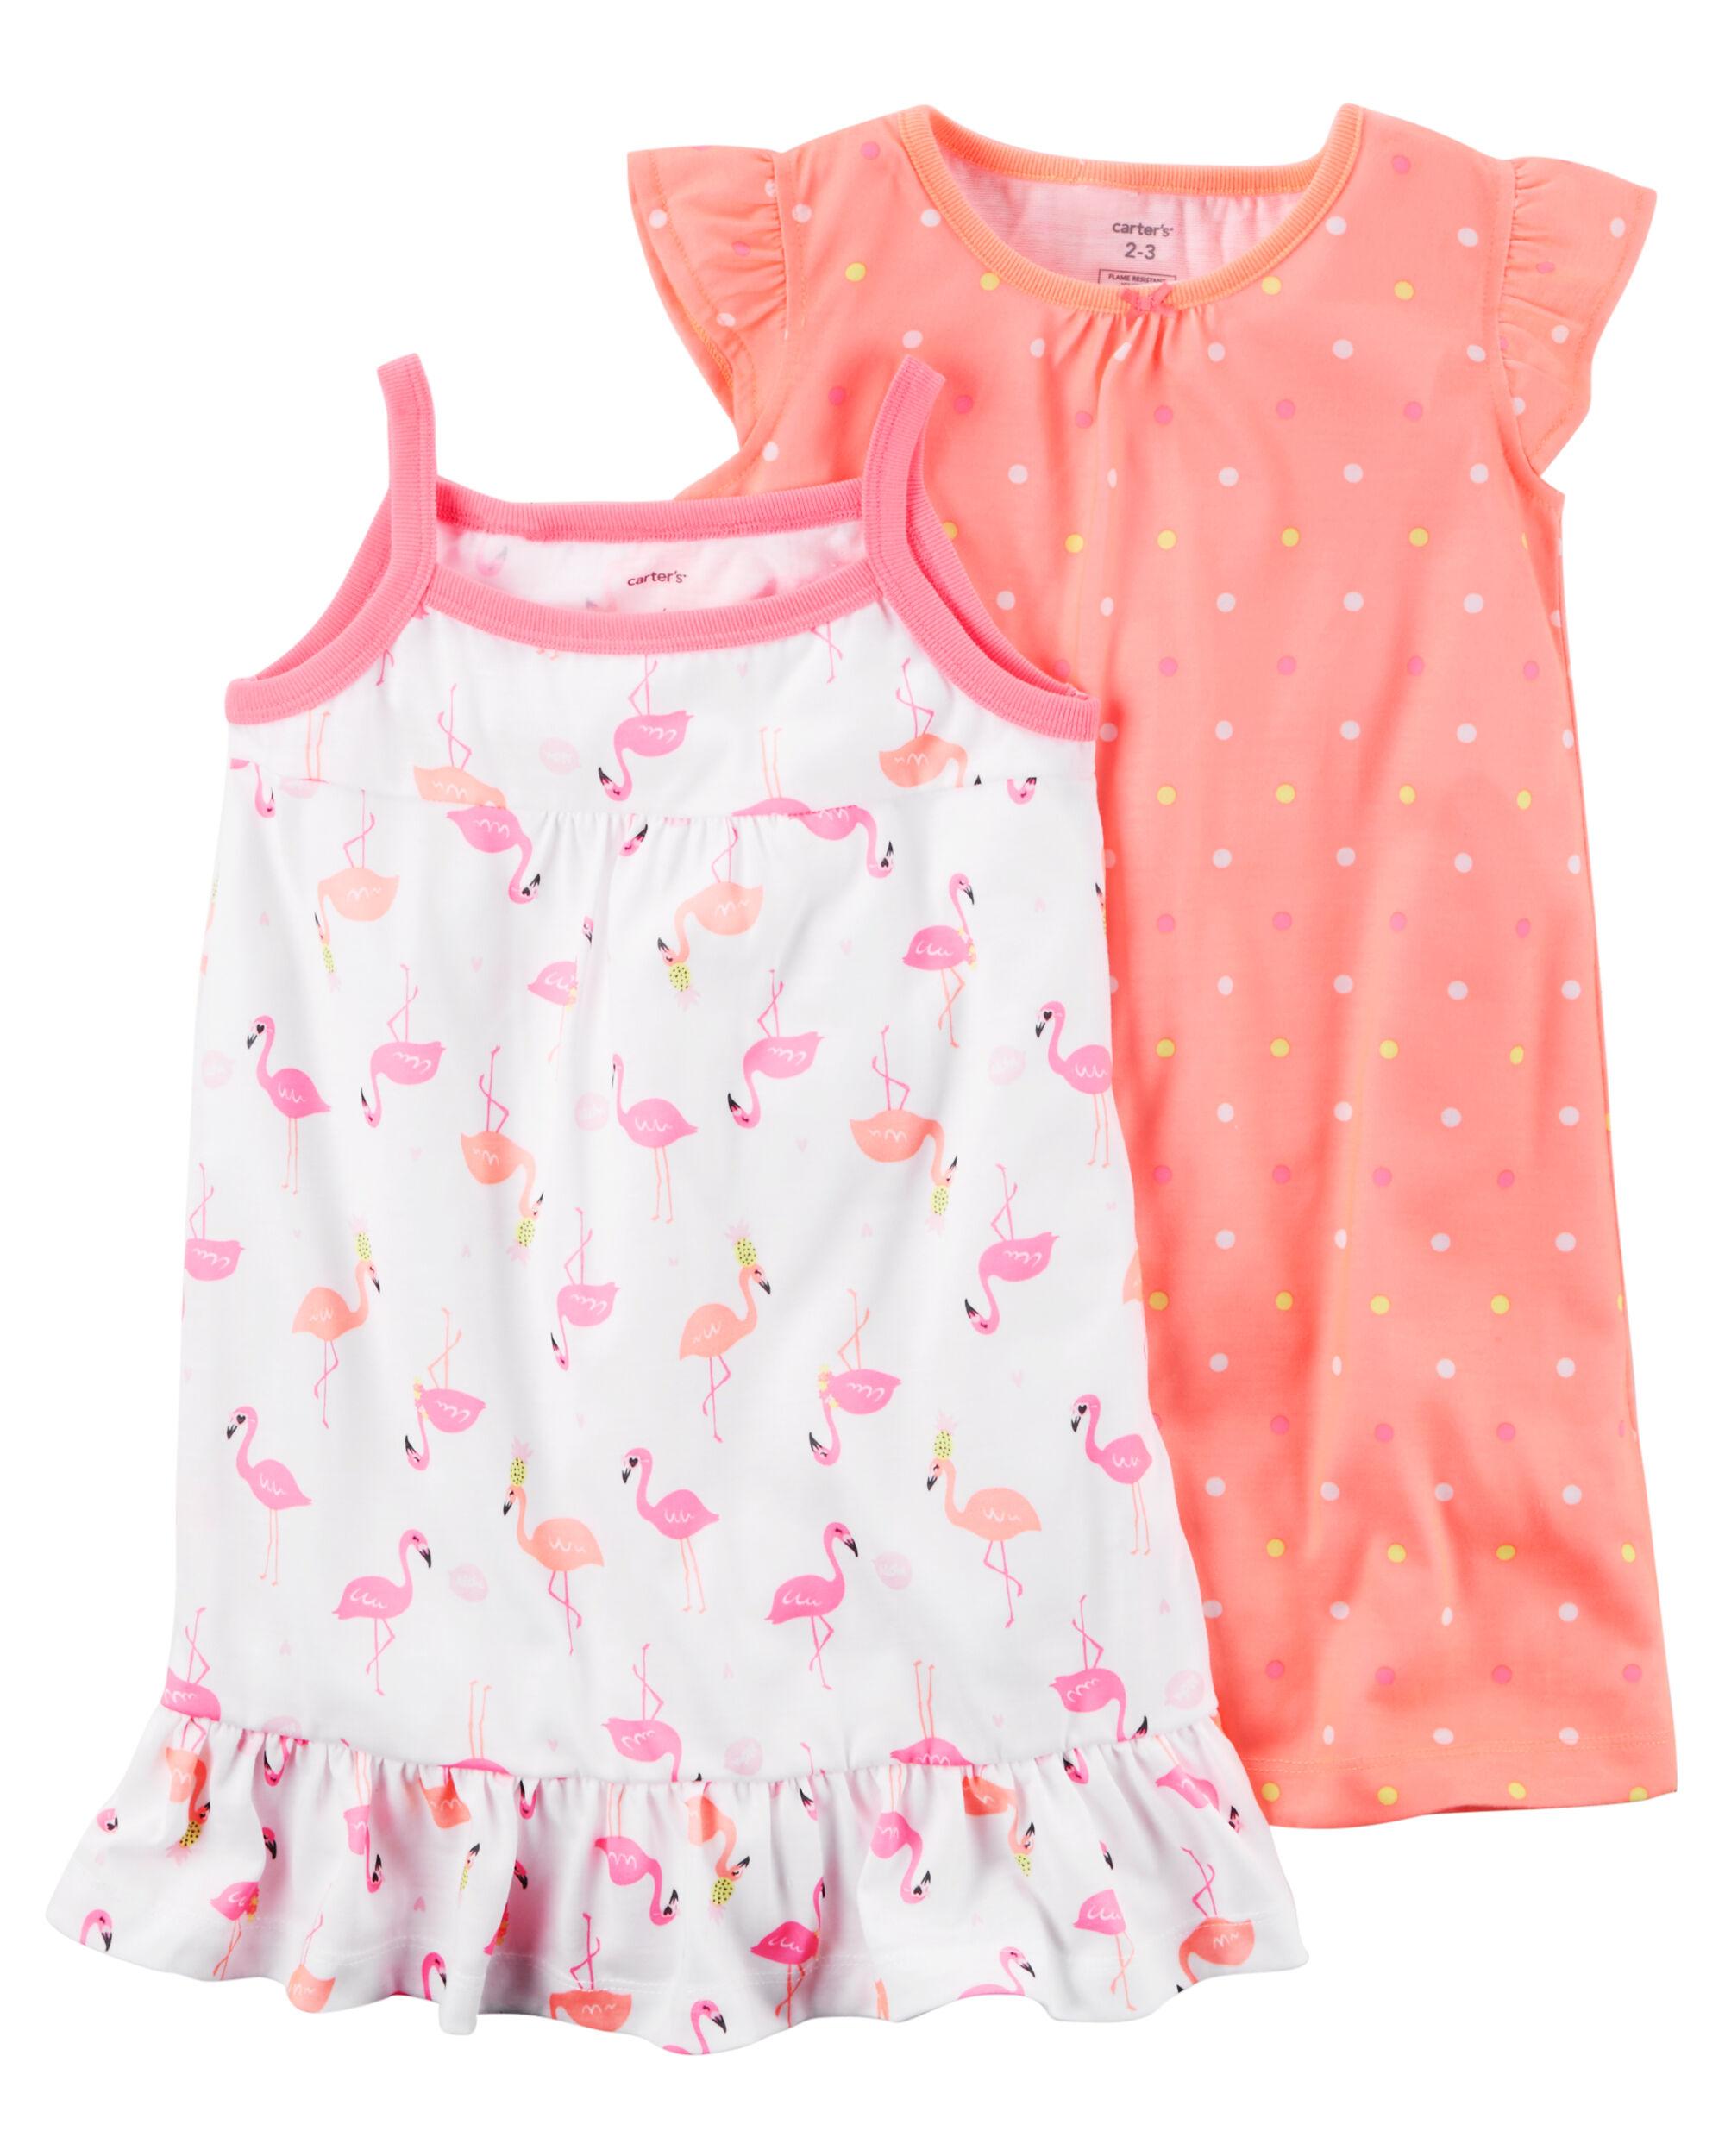 2-Pack Neon Sleep Gowns | Carters.com